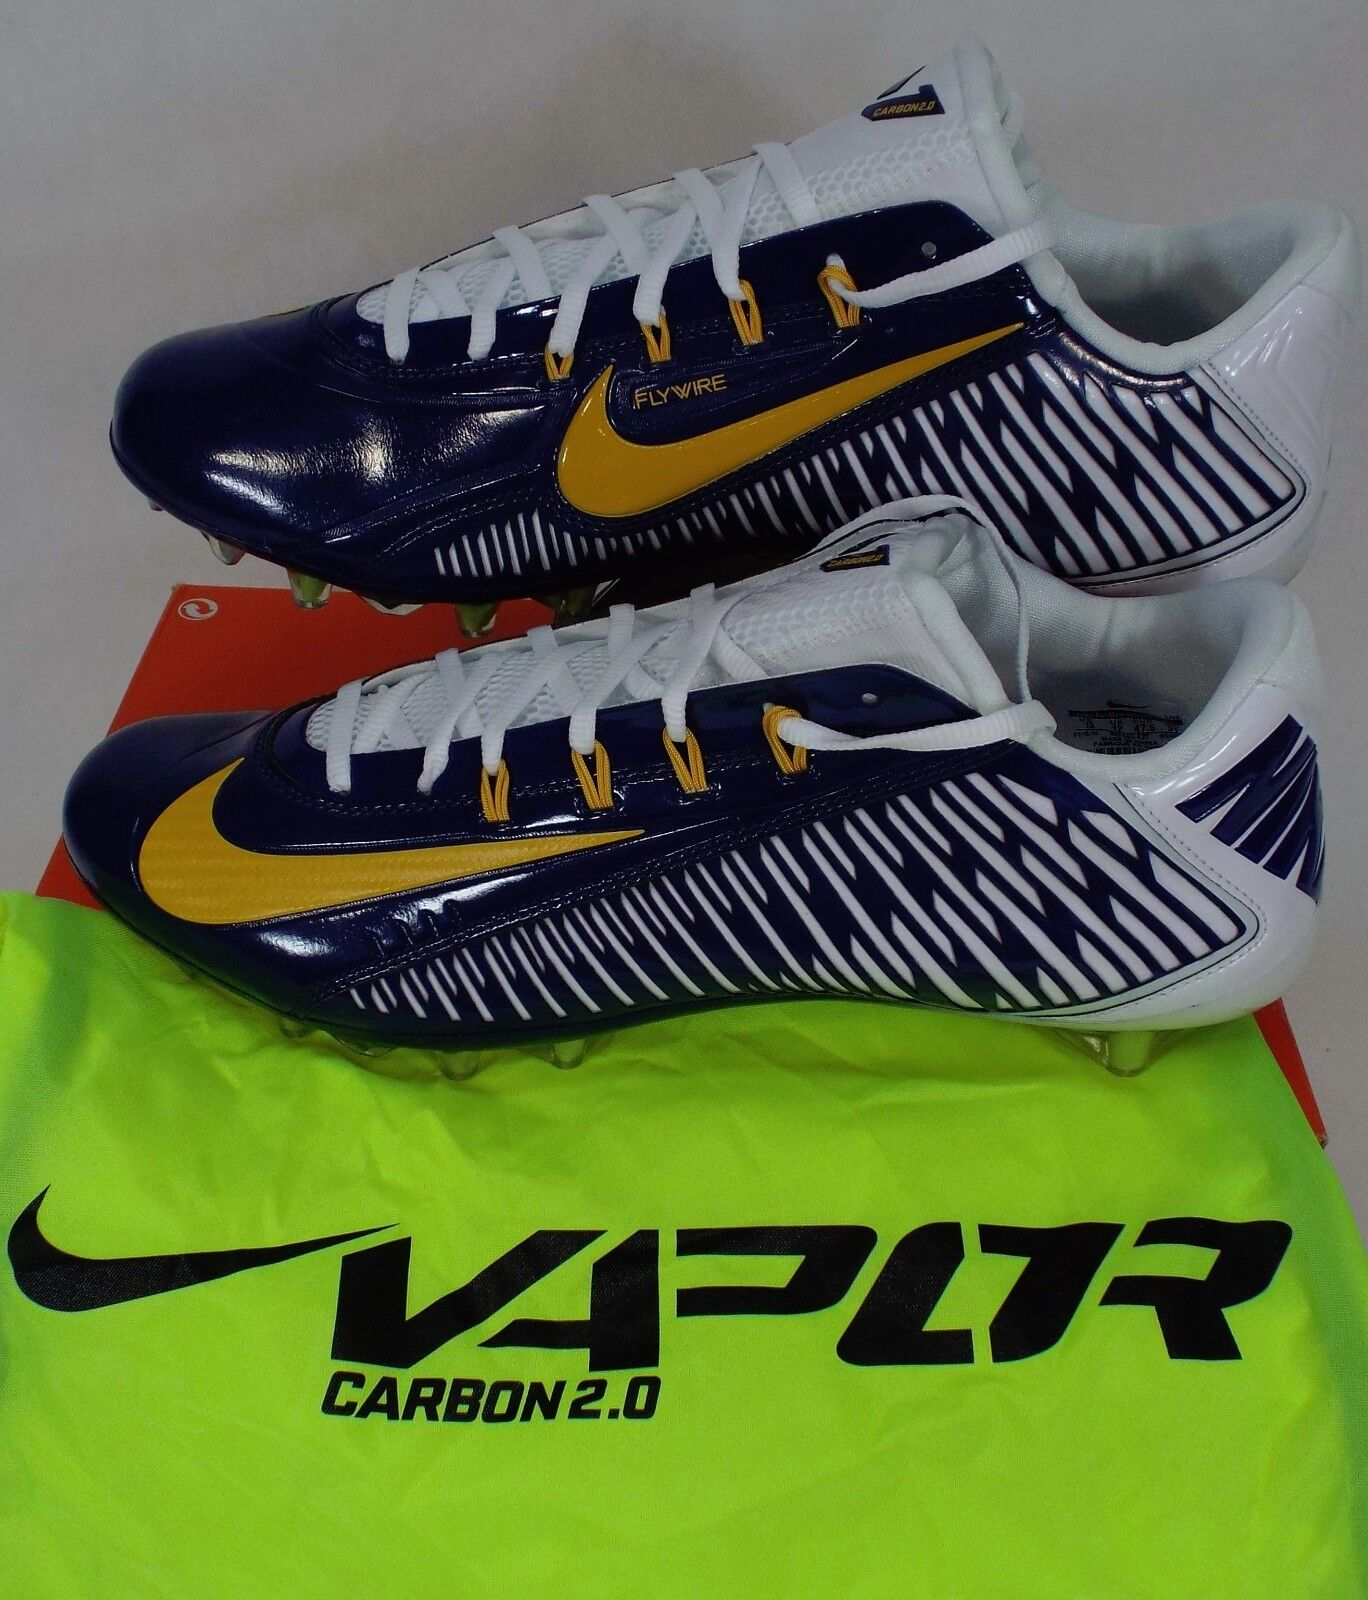 Nuevo Hombre Carbon 13 NIKE Vapor Carbon Hombre Elite 2018 TD PF Navy Botines Zapatos   657441 -427 8ccf8d